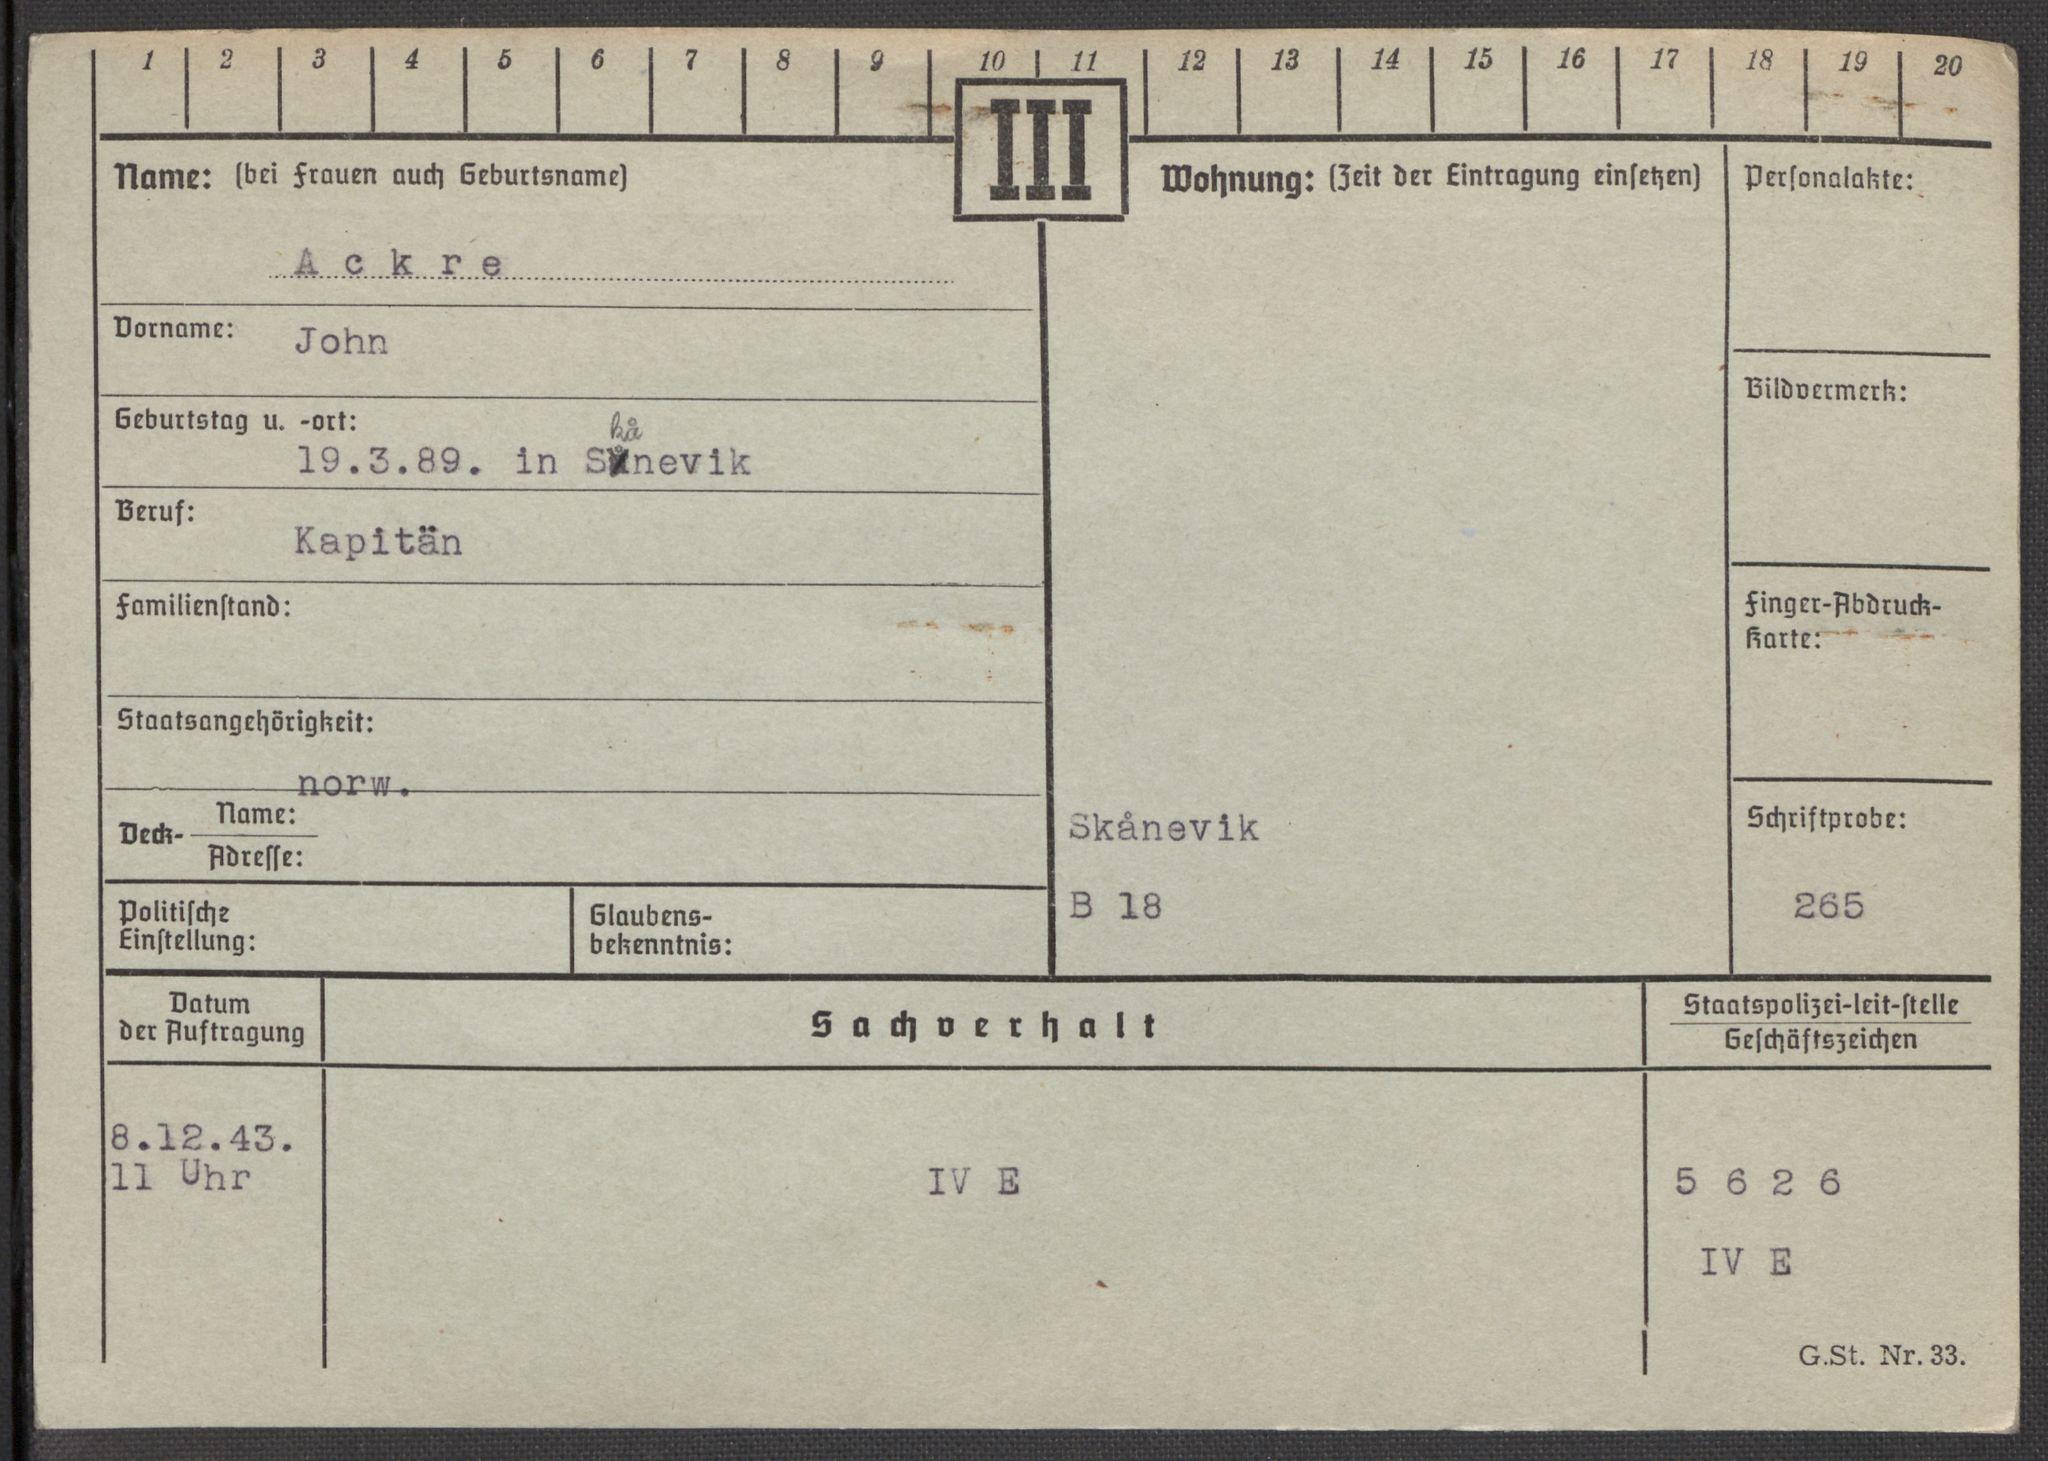 RA, Befehlshaber der Sicherheitspolizei und des SD, E/Ea/Eaa/L0001: Register over norske fanger i Møllergata 19: A-Bj, 1940-1945, s. 28